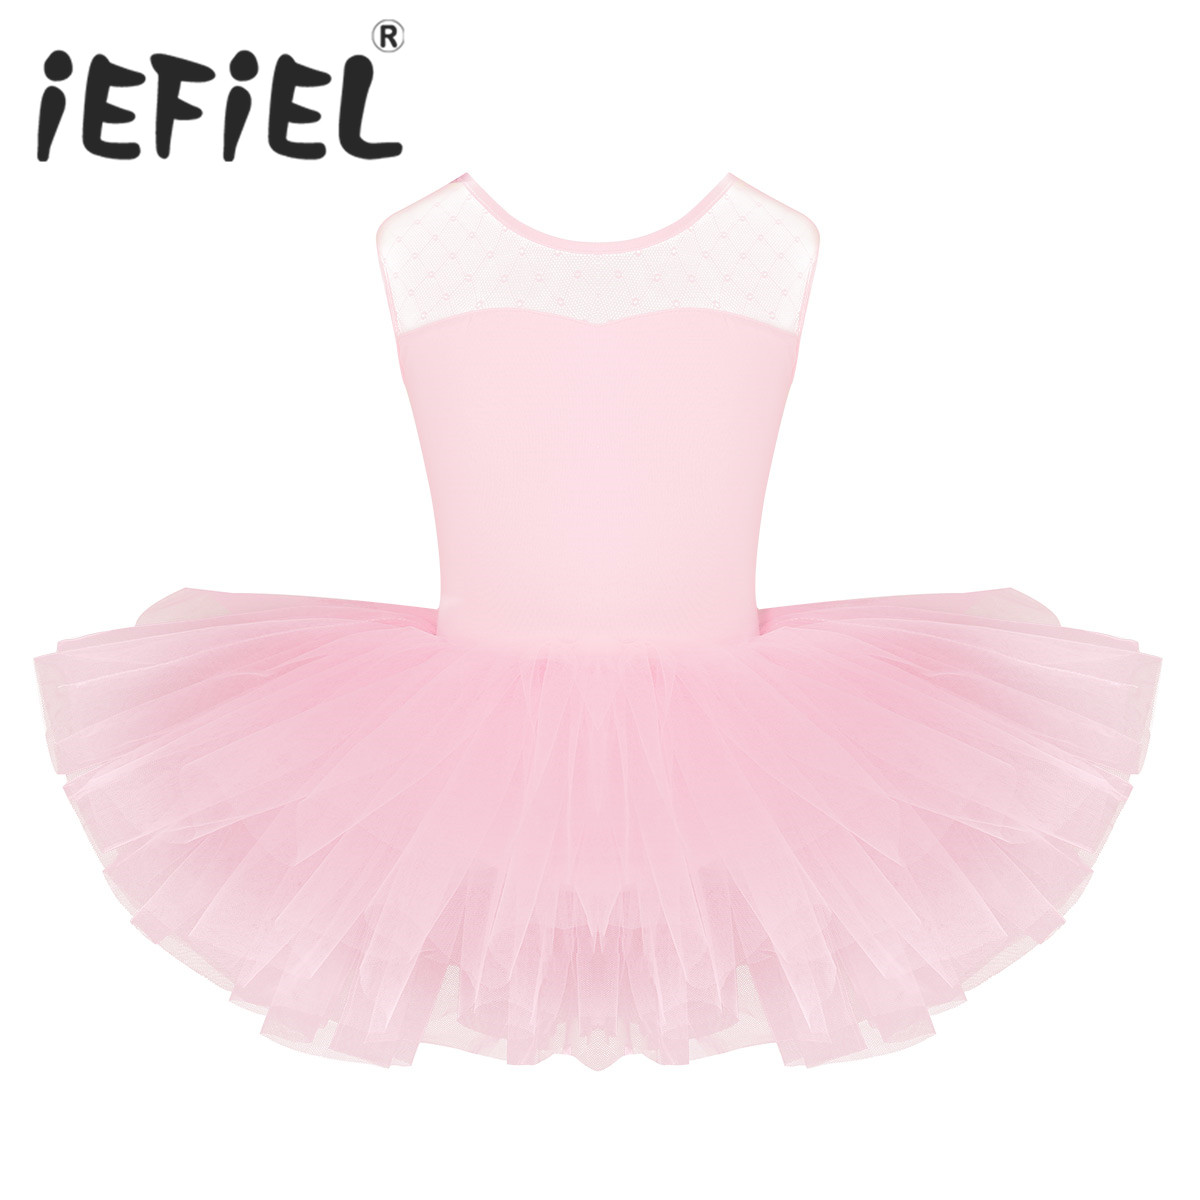 Cute Children Kids Girls Short Sleeves Stretch Mesh Splice U-shaped Back Ballet Dance Gymnastics Leotard Tutu Performance Dress